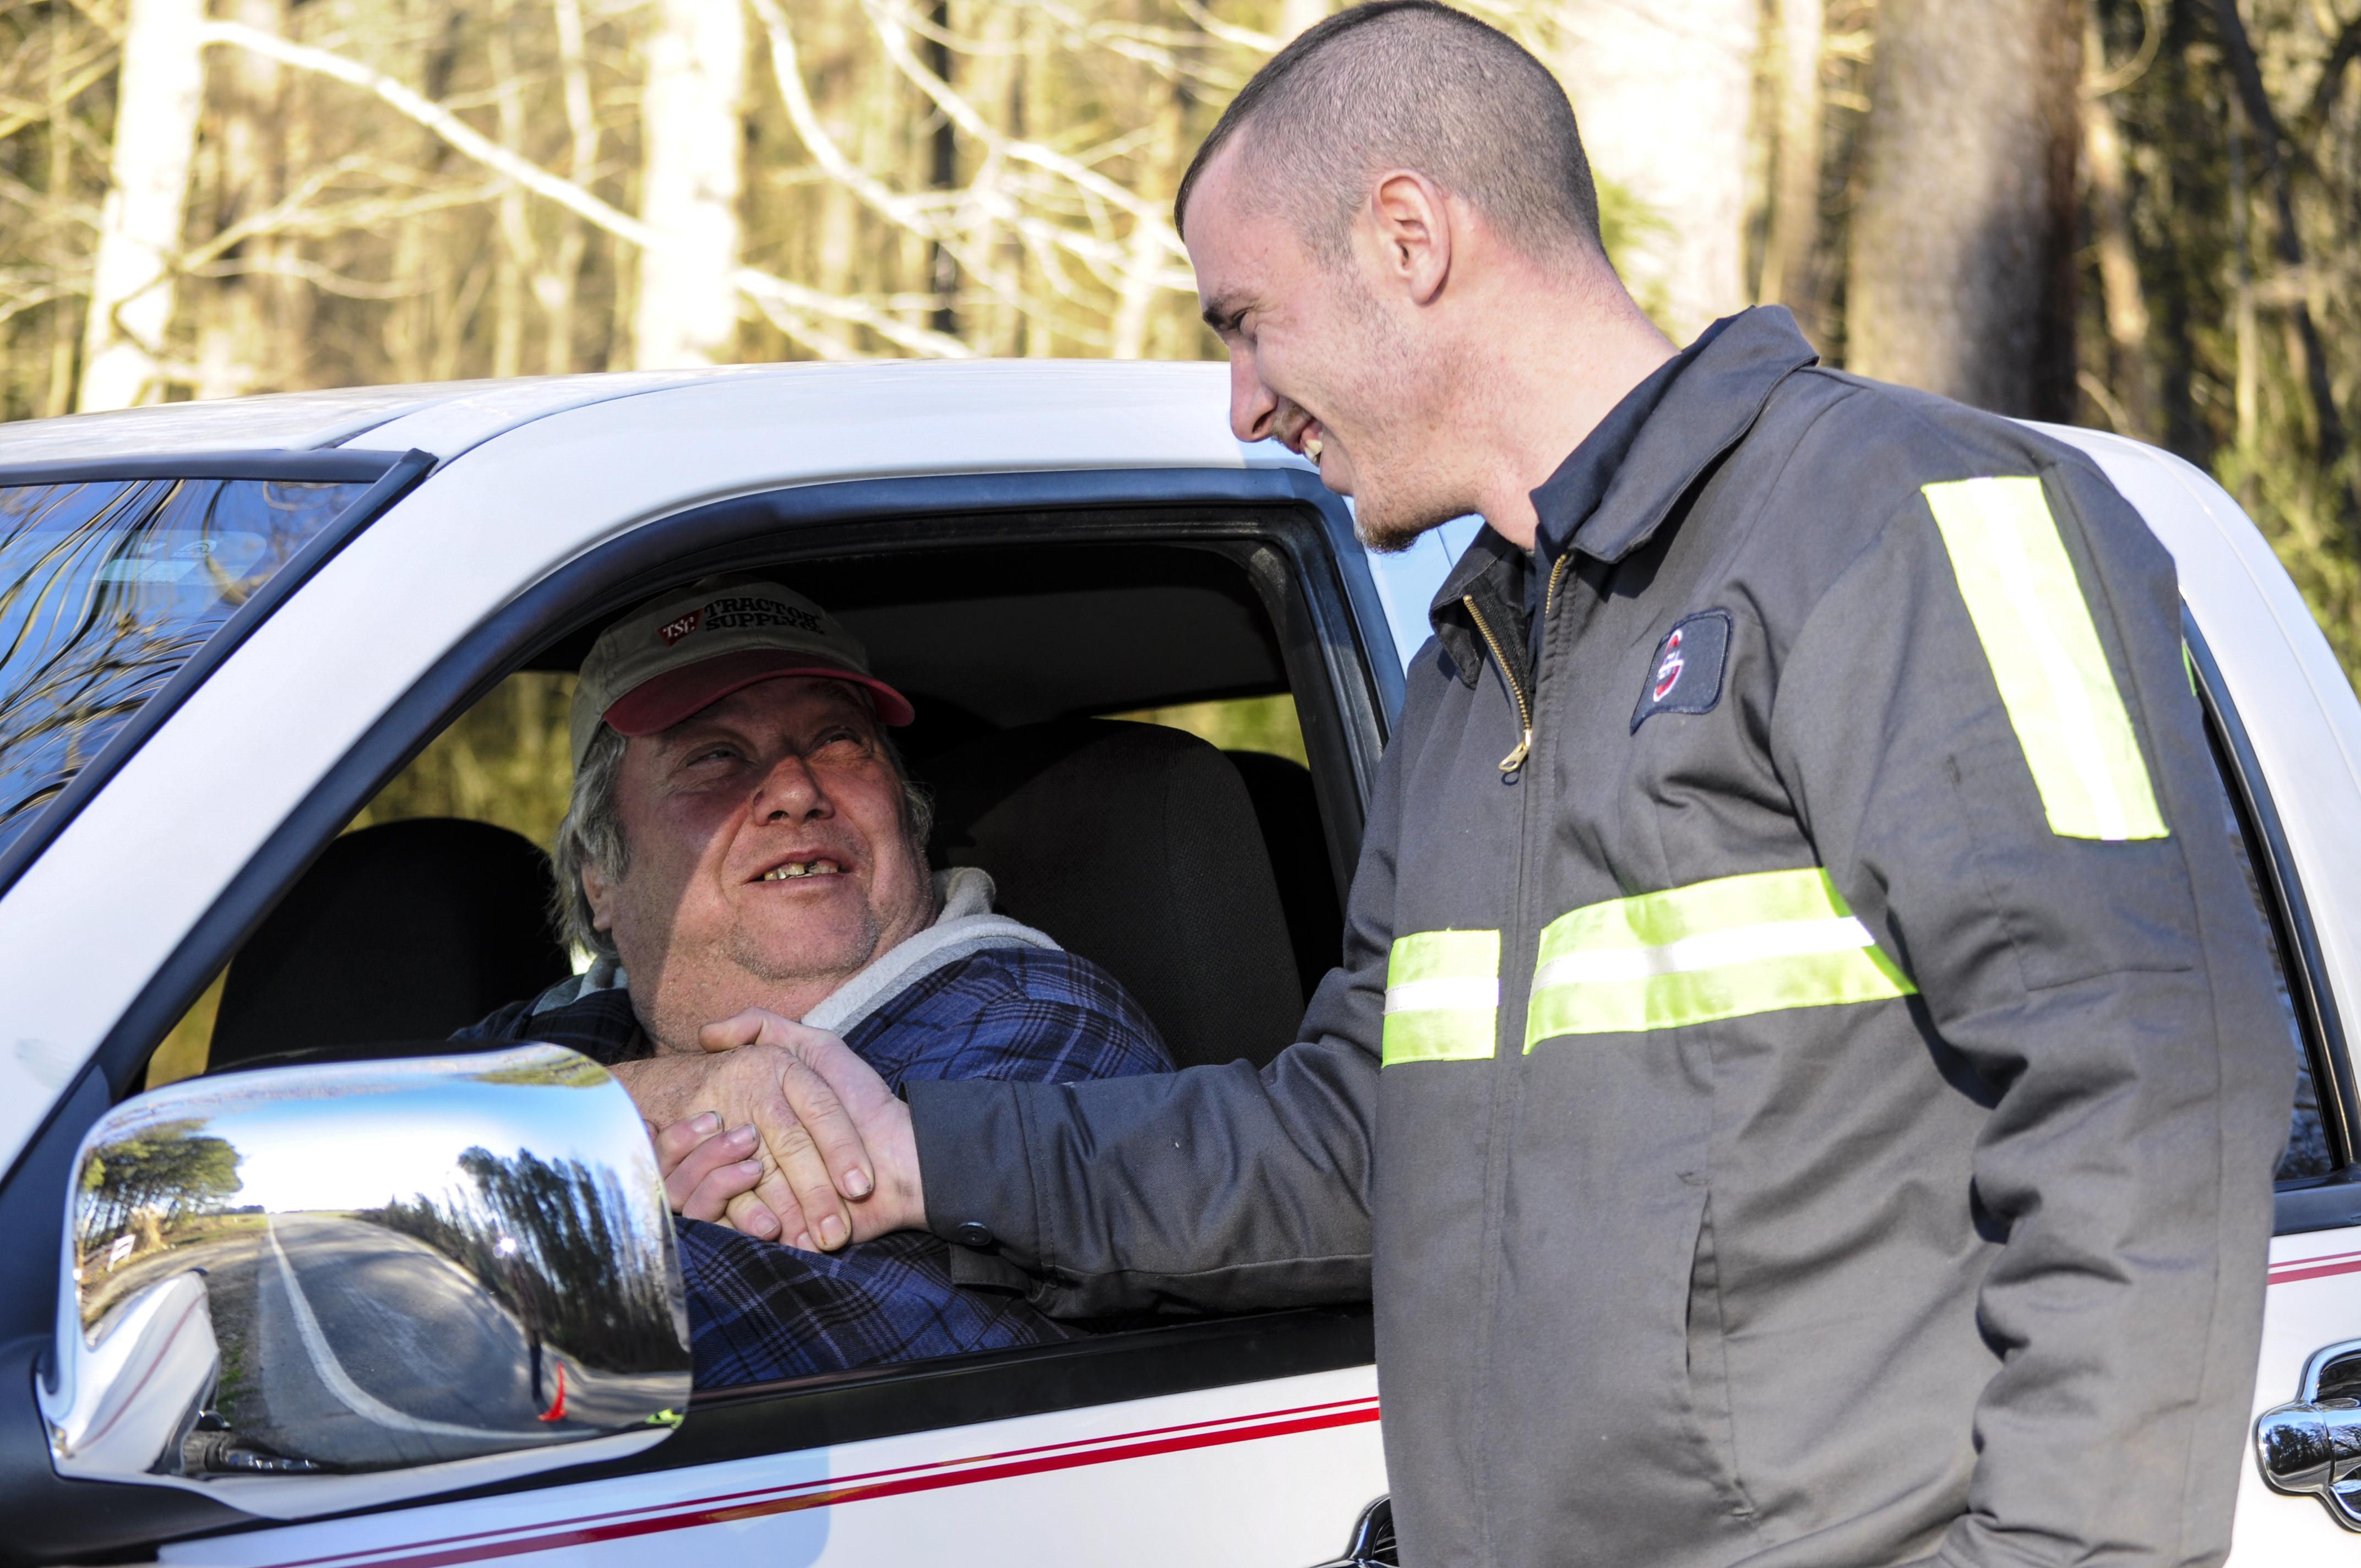 Advance Emergency Roadside Assistance High Point Nc 27265